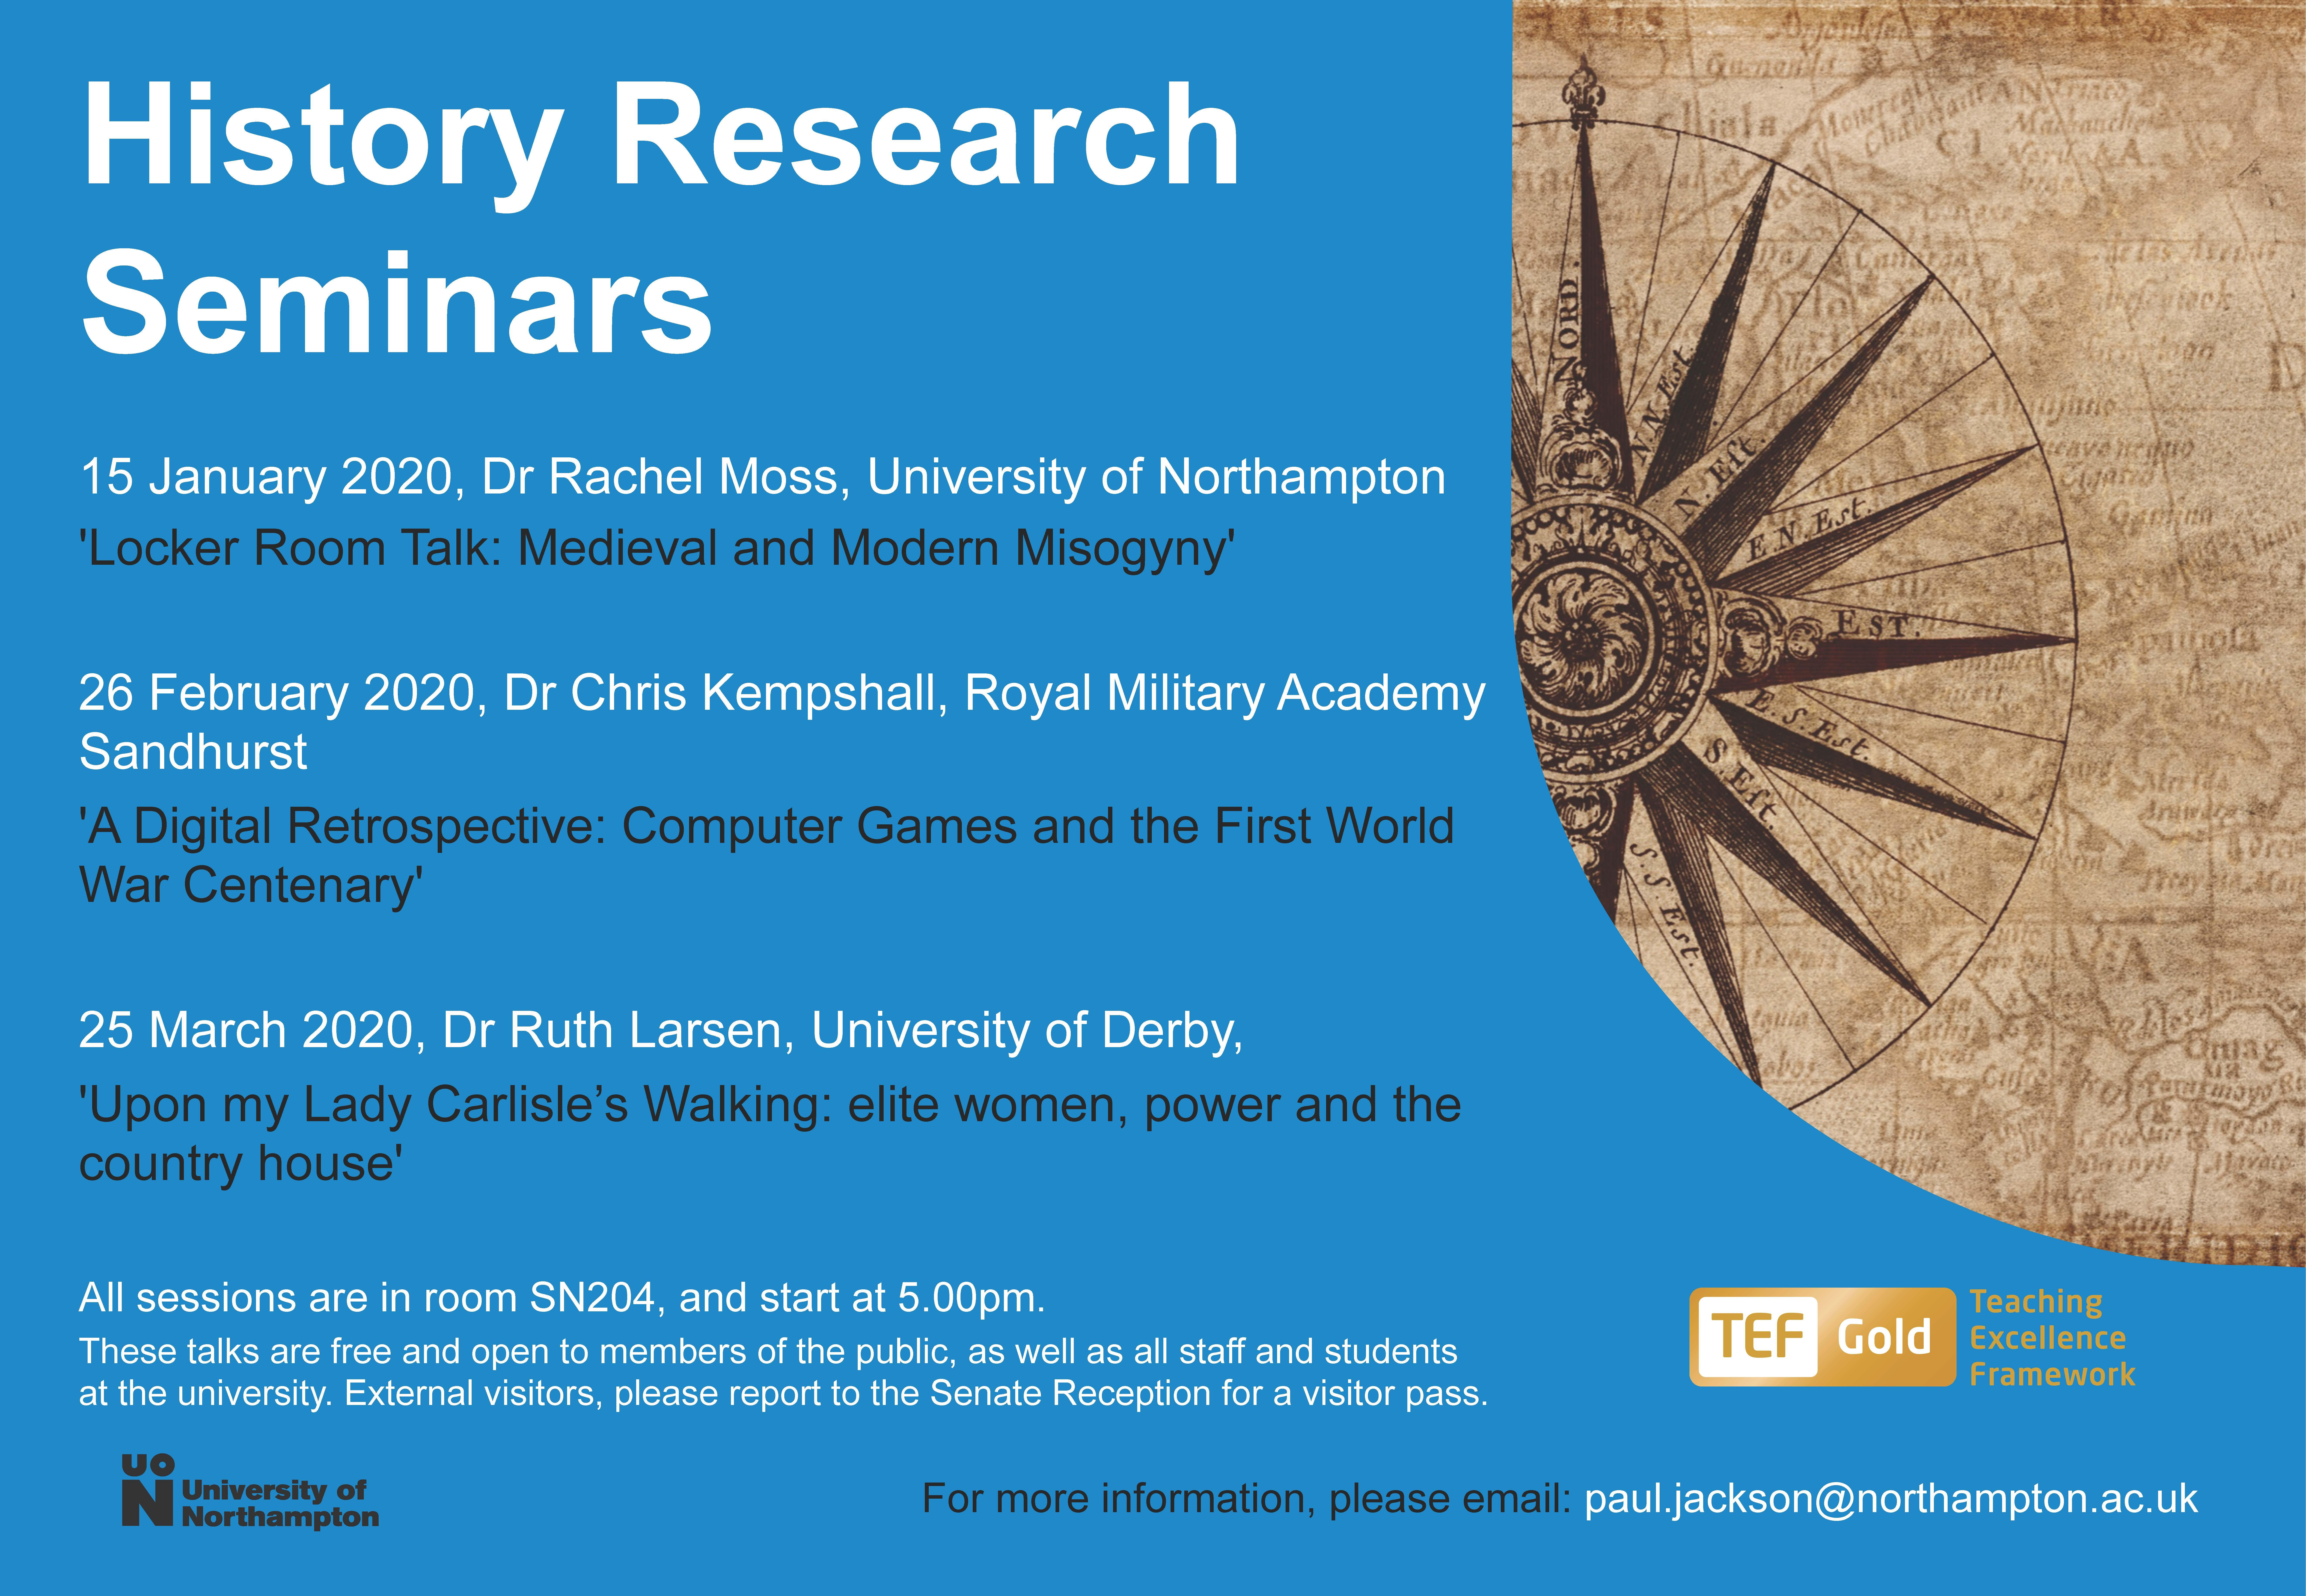 History Research Seminars 2020